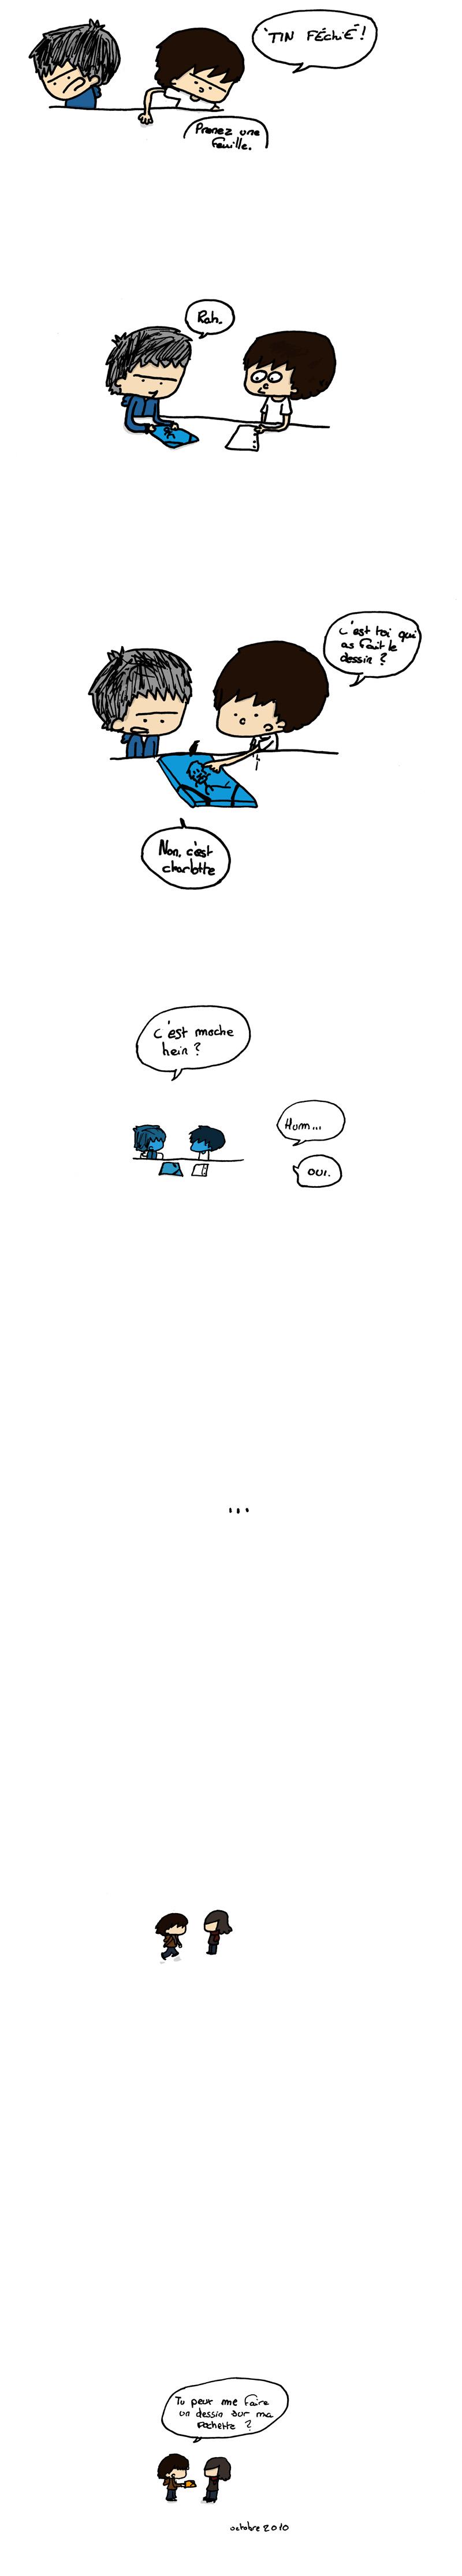 http://evoflo.free.fr/bd/dessindec.jpg